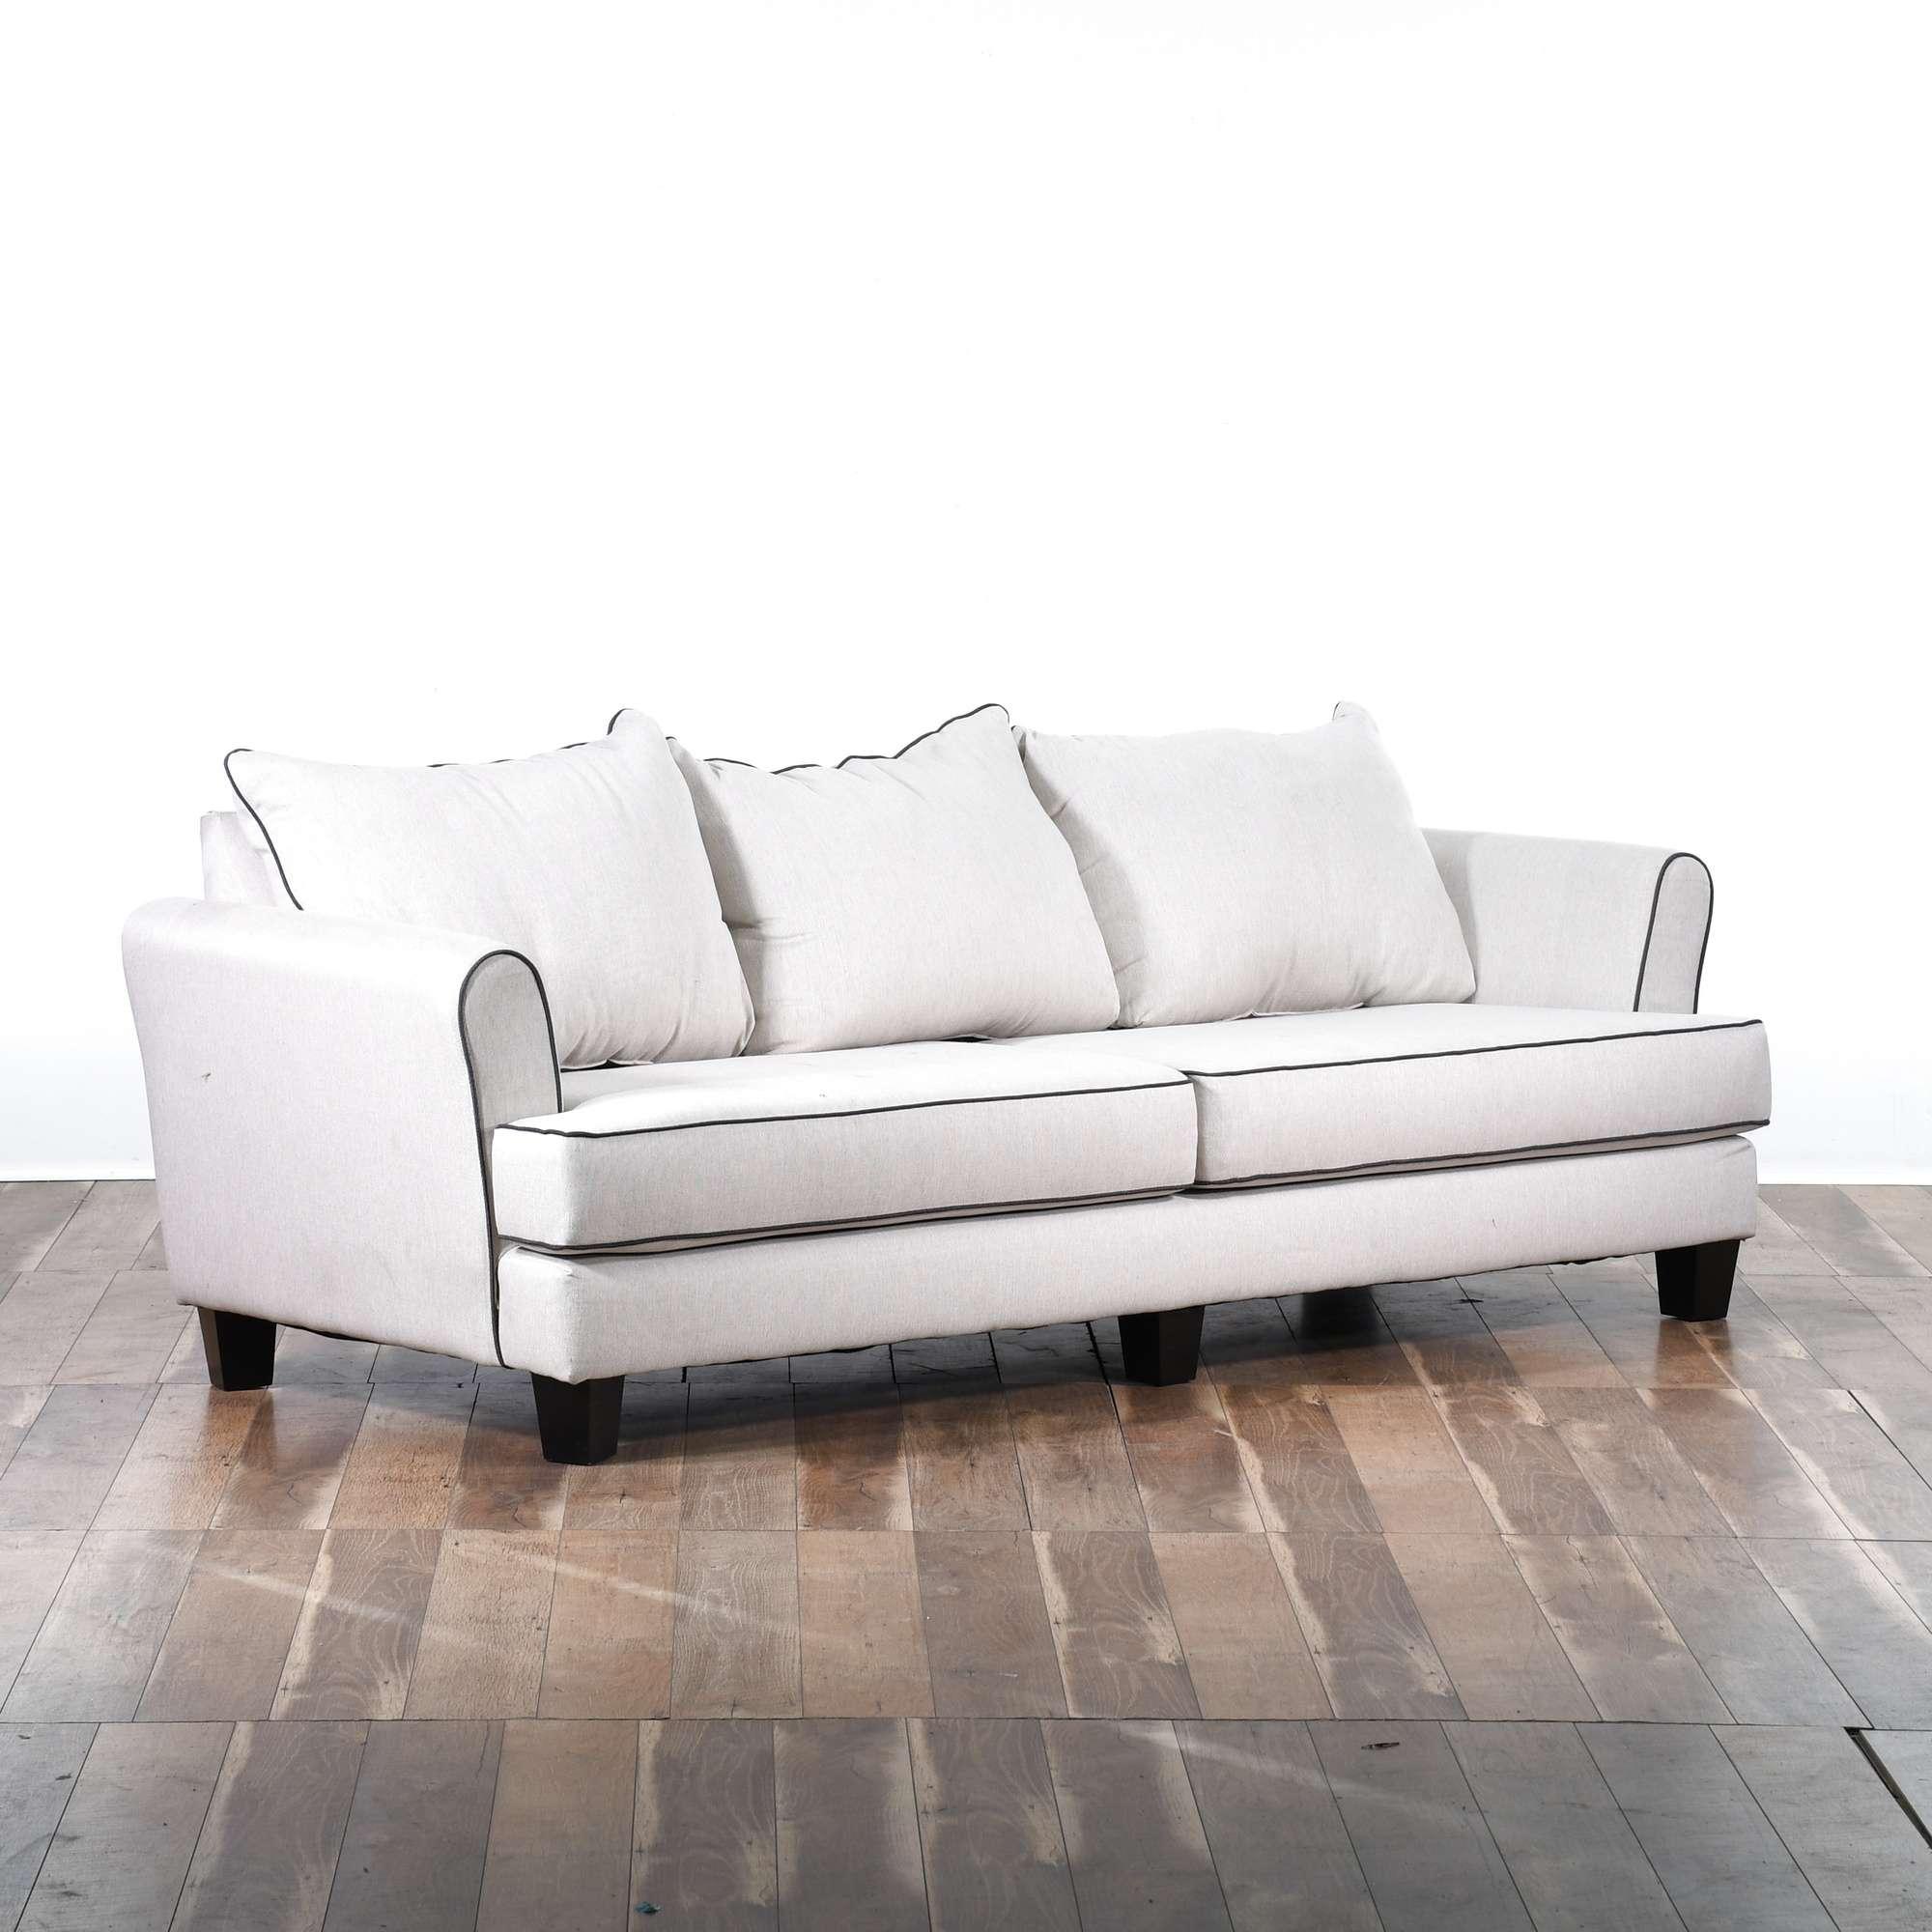 Contemporary White Sofa W Black Trim   Loveseat Online Auctions Los Angeles